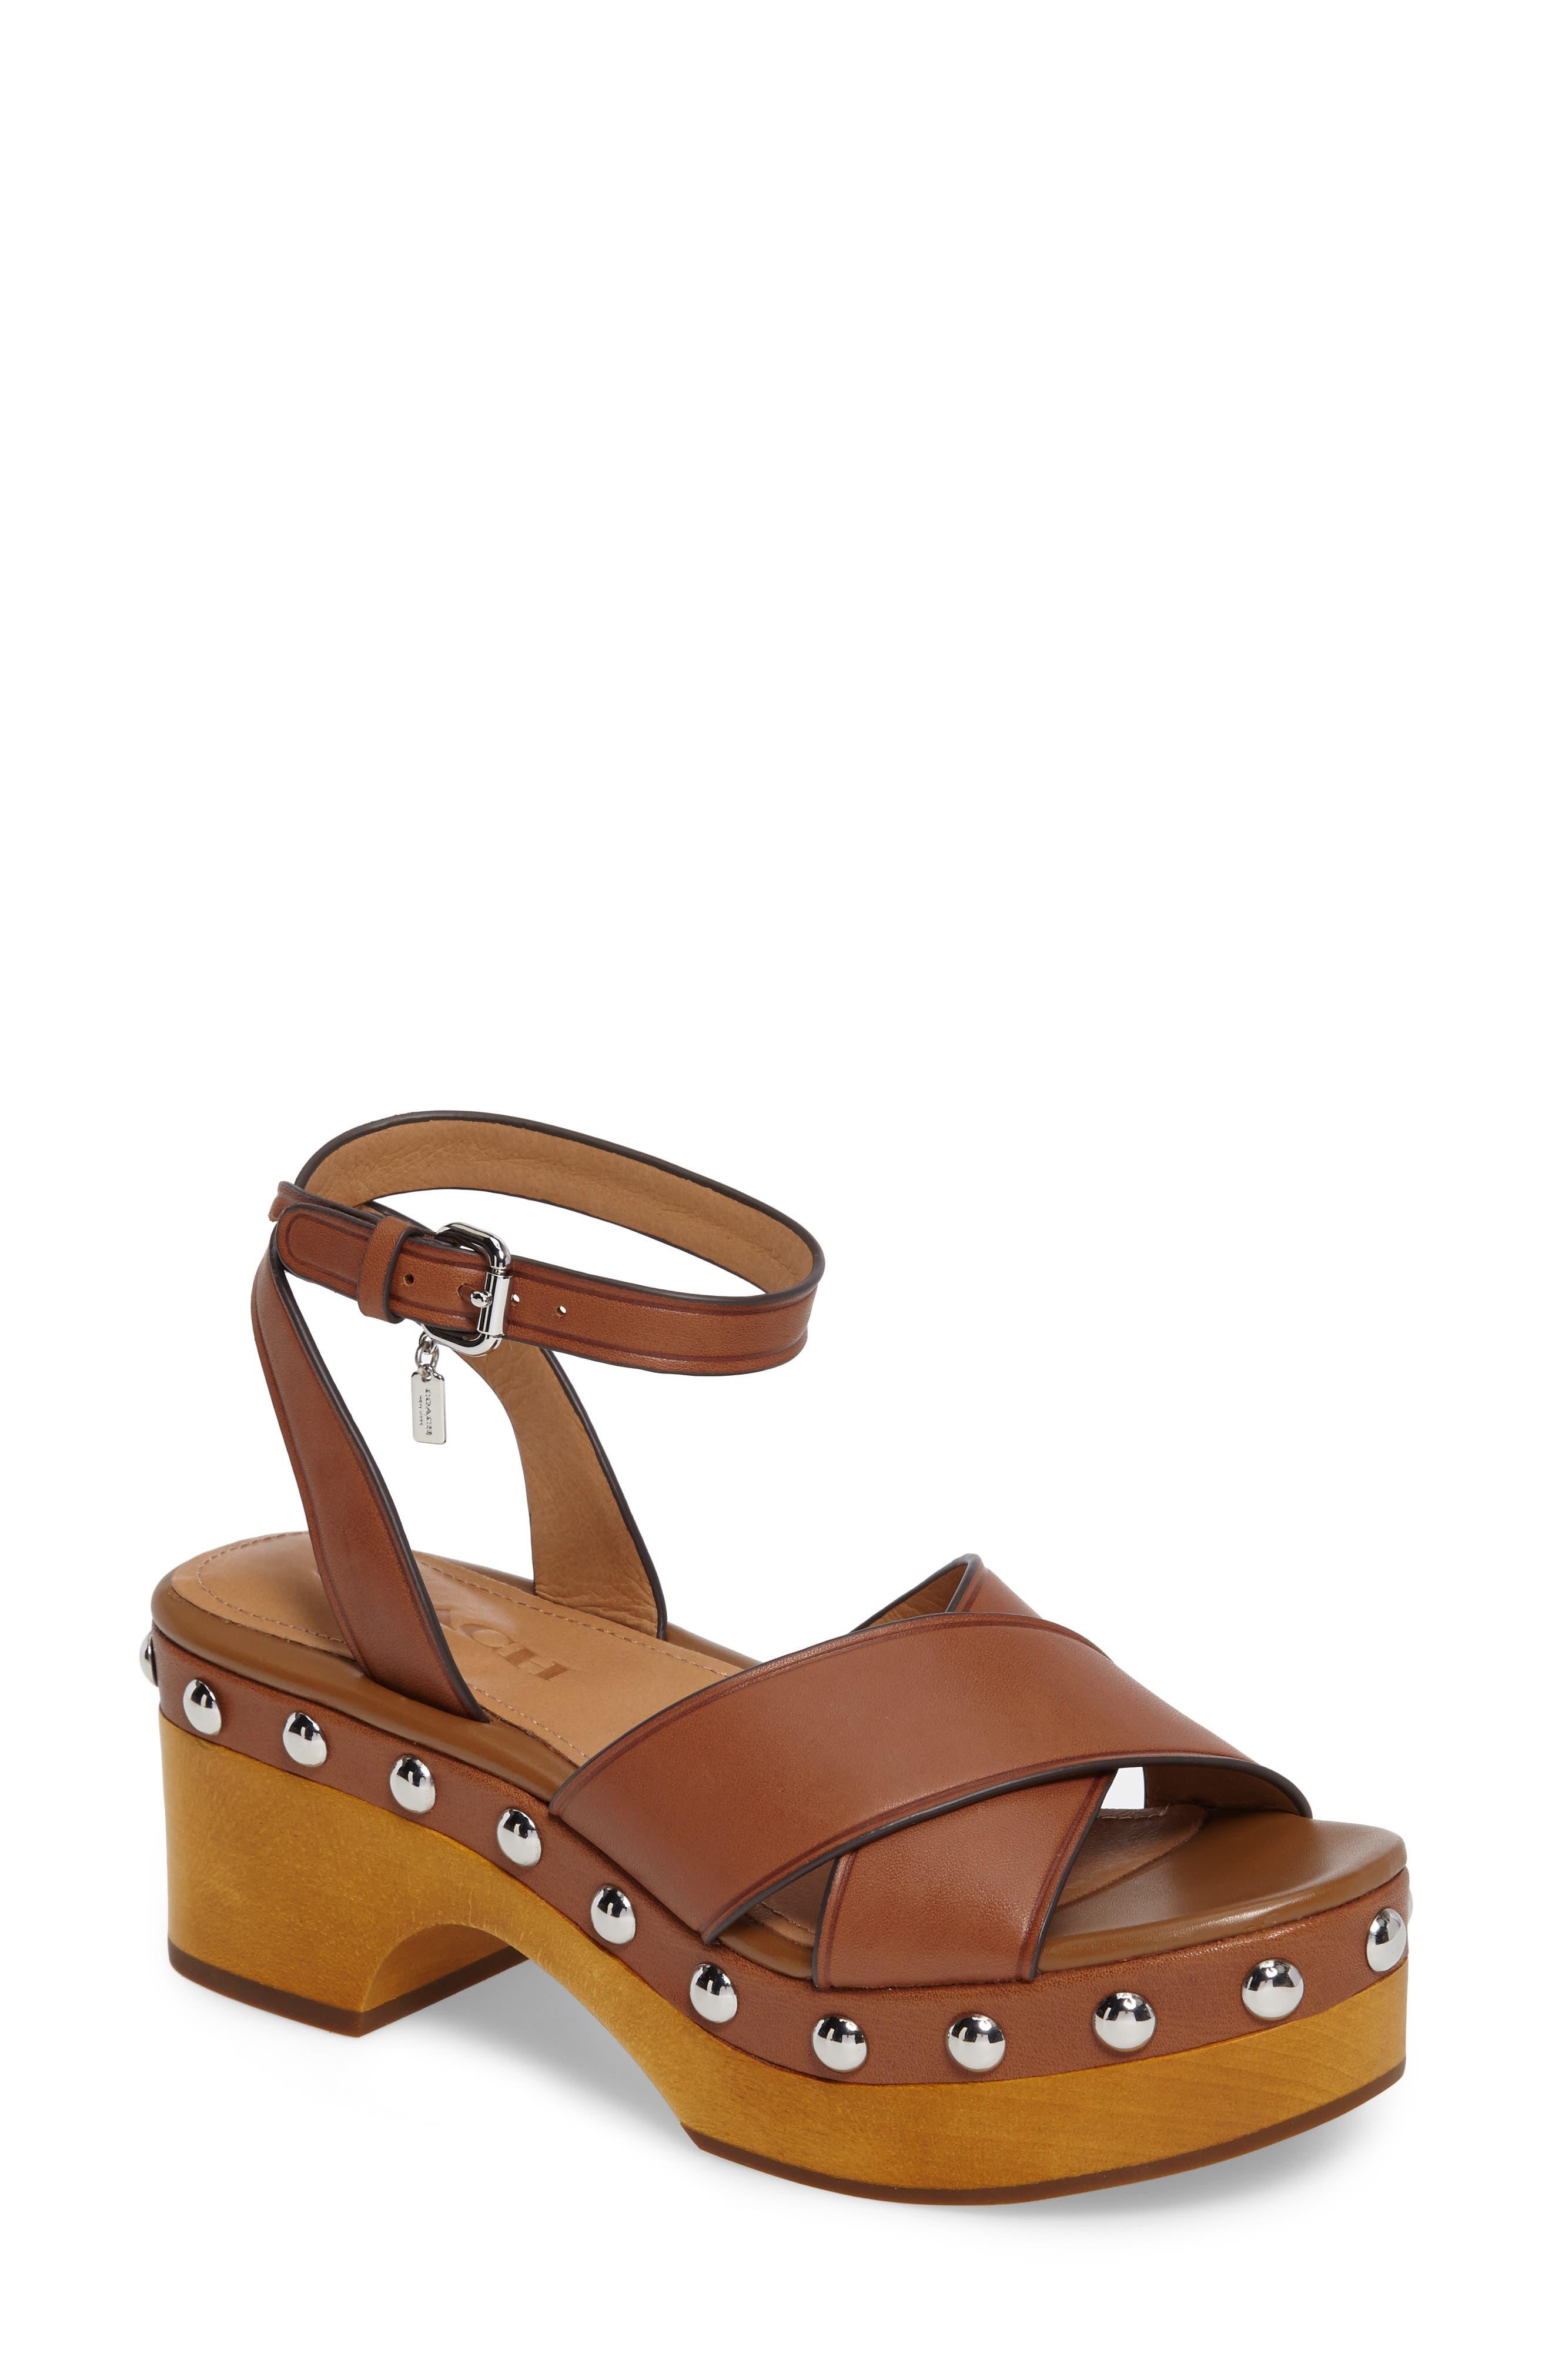 COACH Astor Clog Platform Sandal